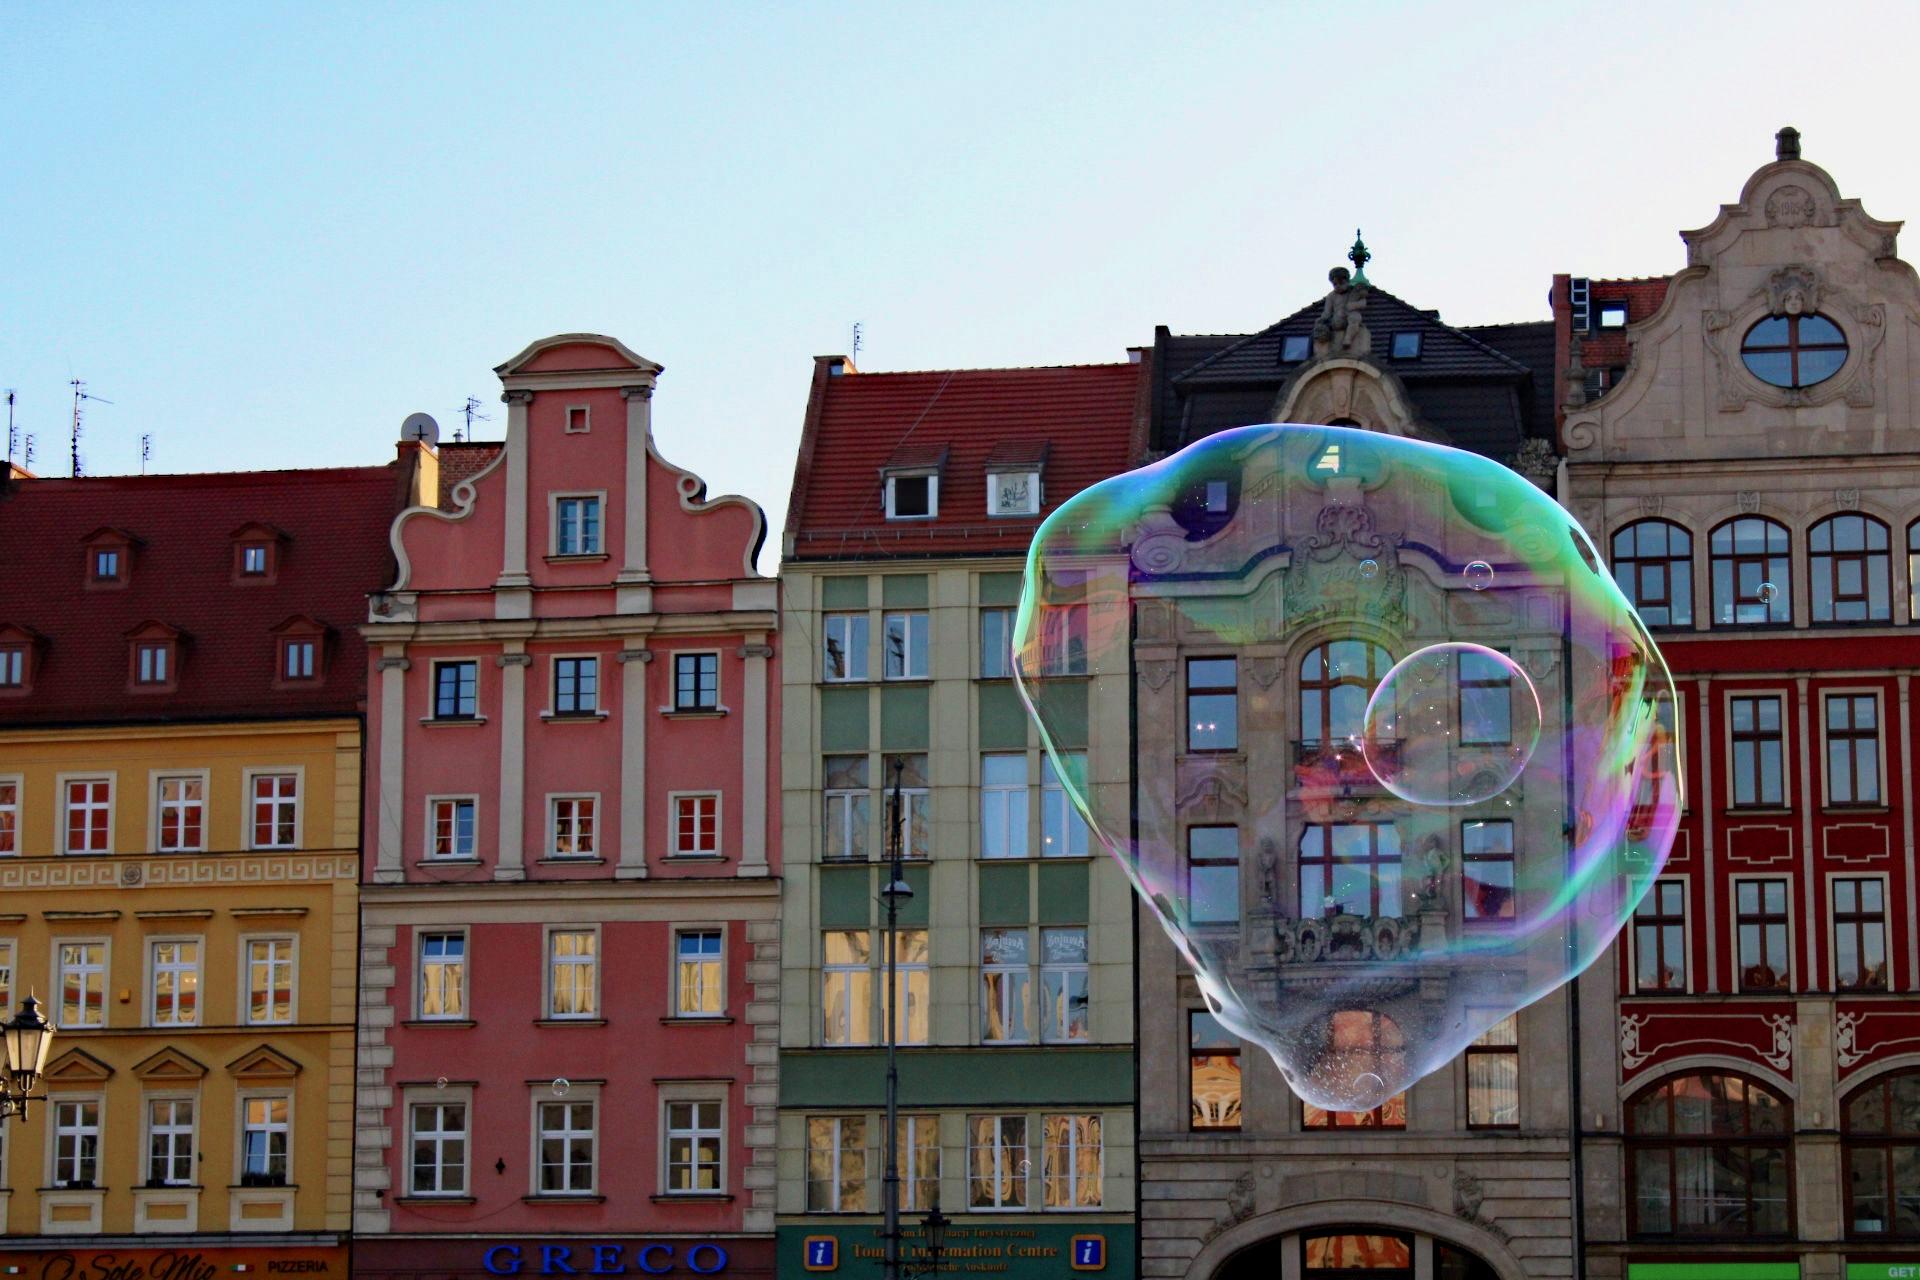 15 Travel Destinations for a Cheap European City Break